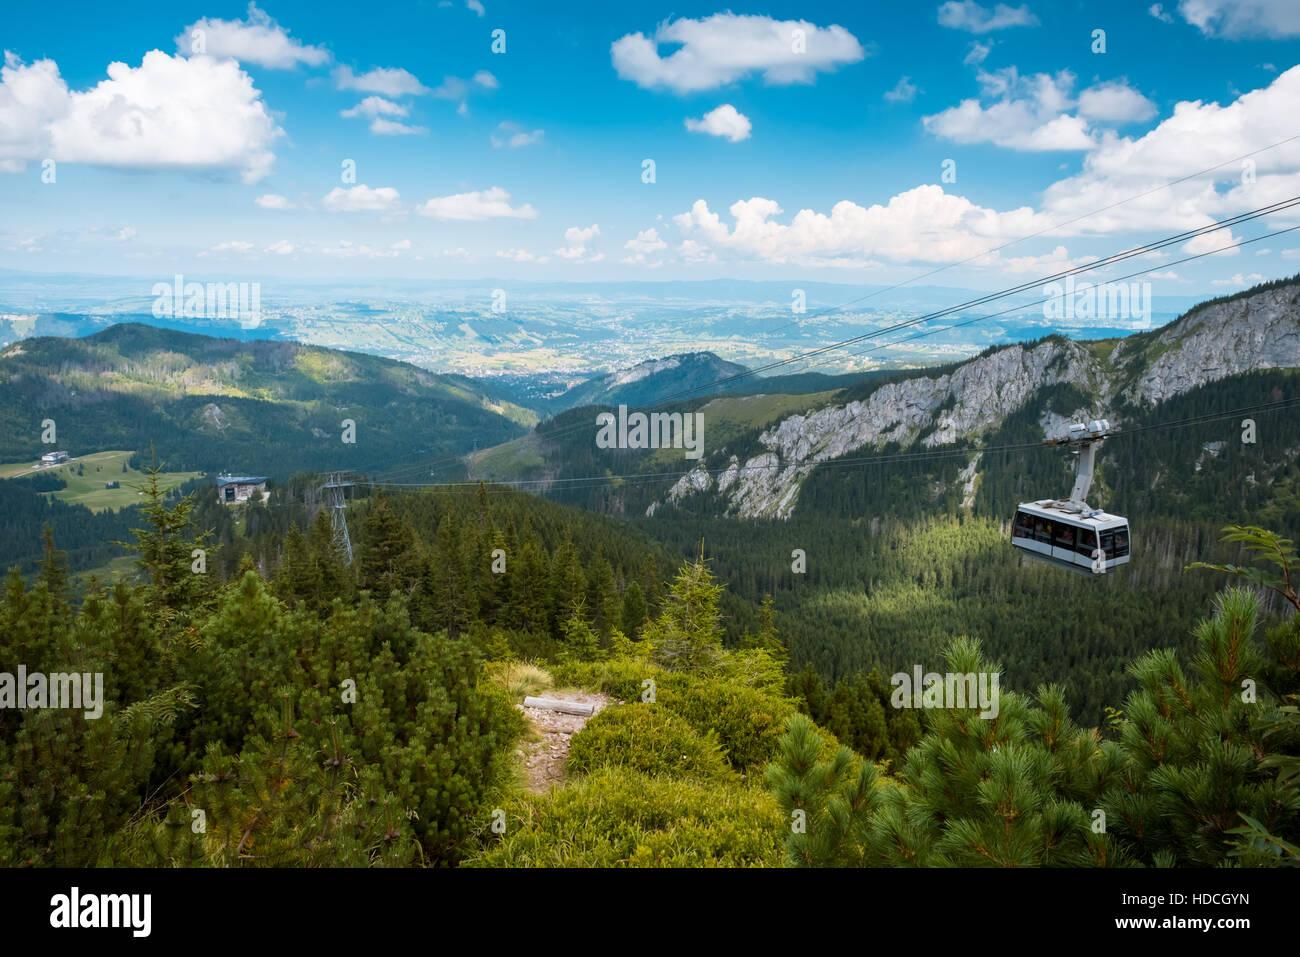 Mountain cableway in poland Tatras, Zakopane - Stock Image